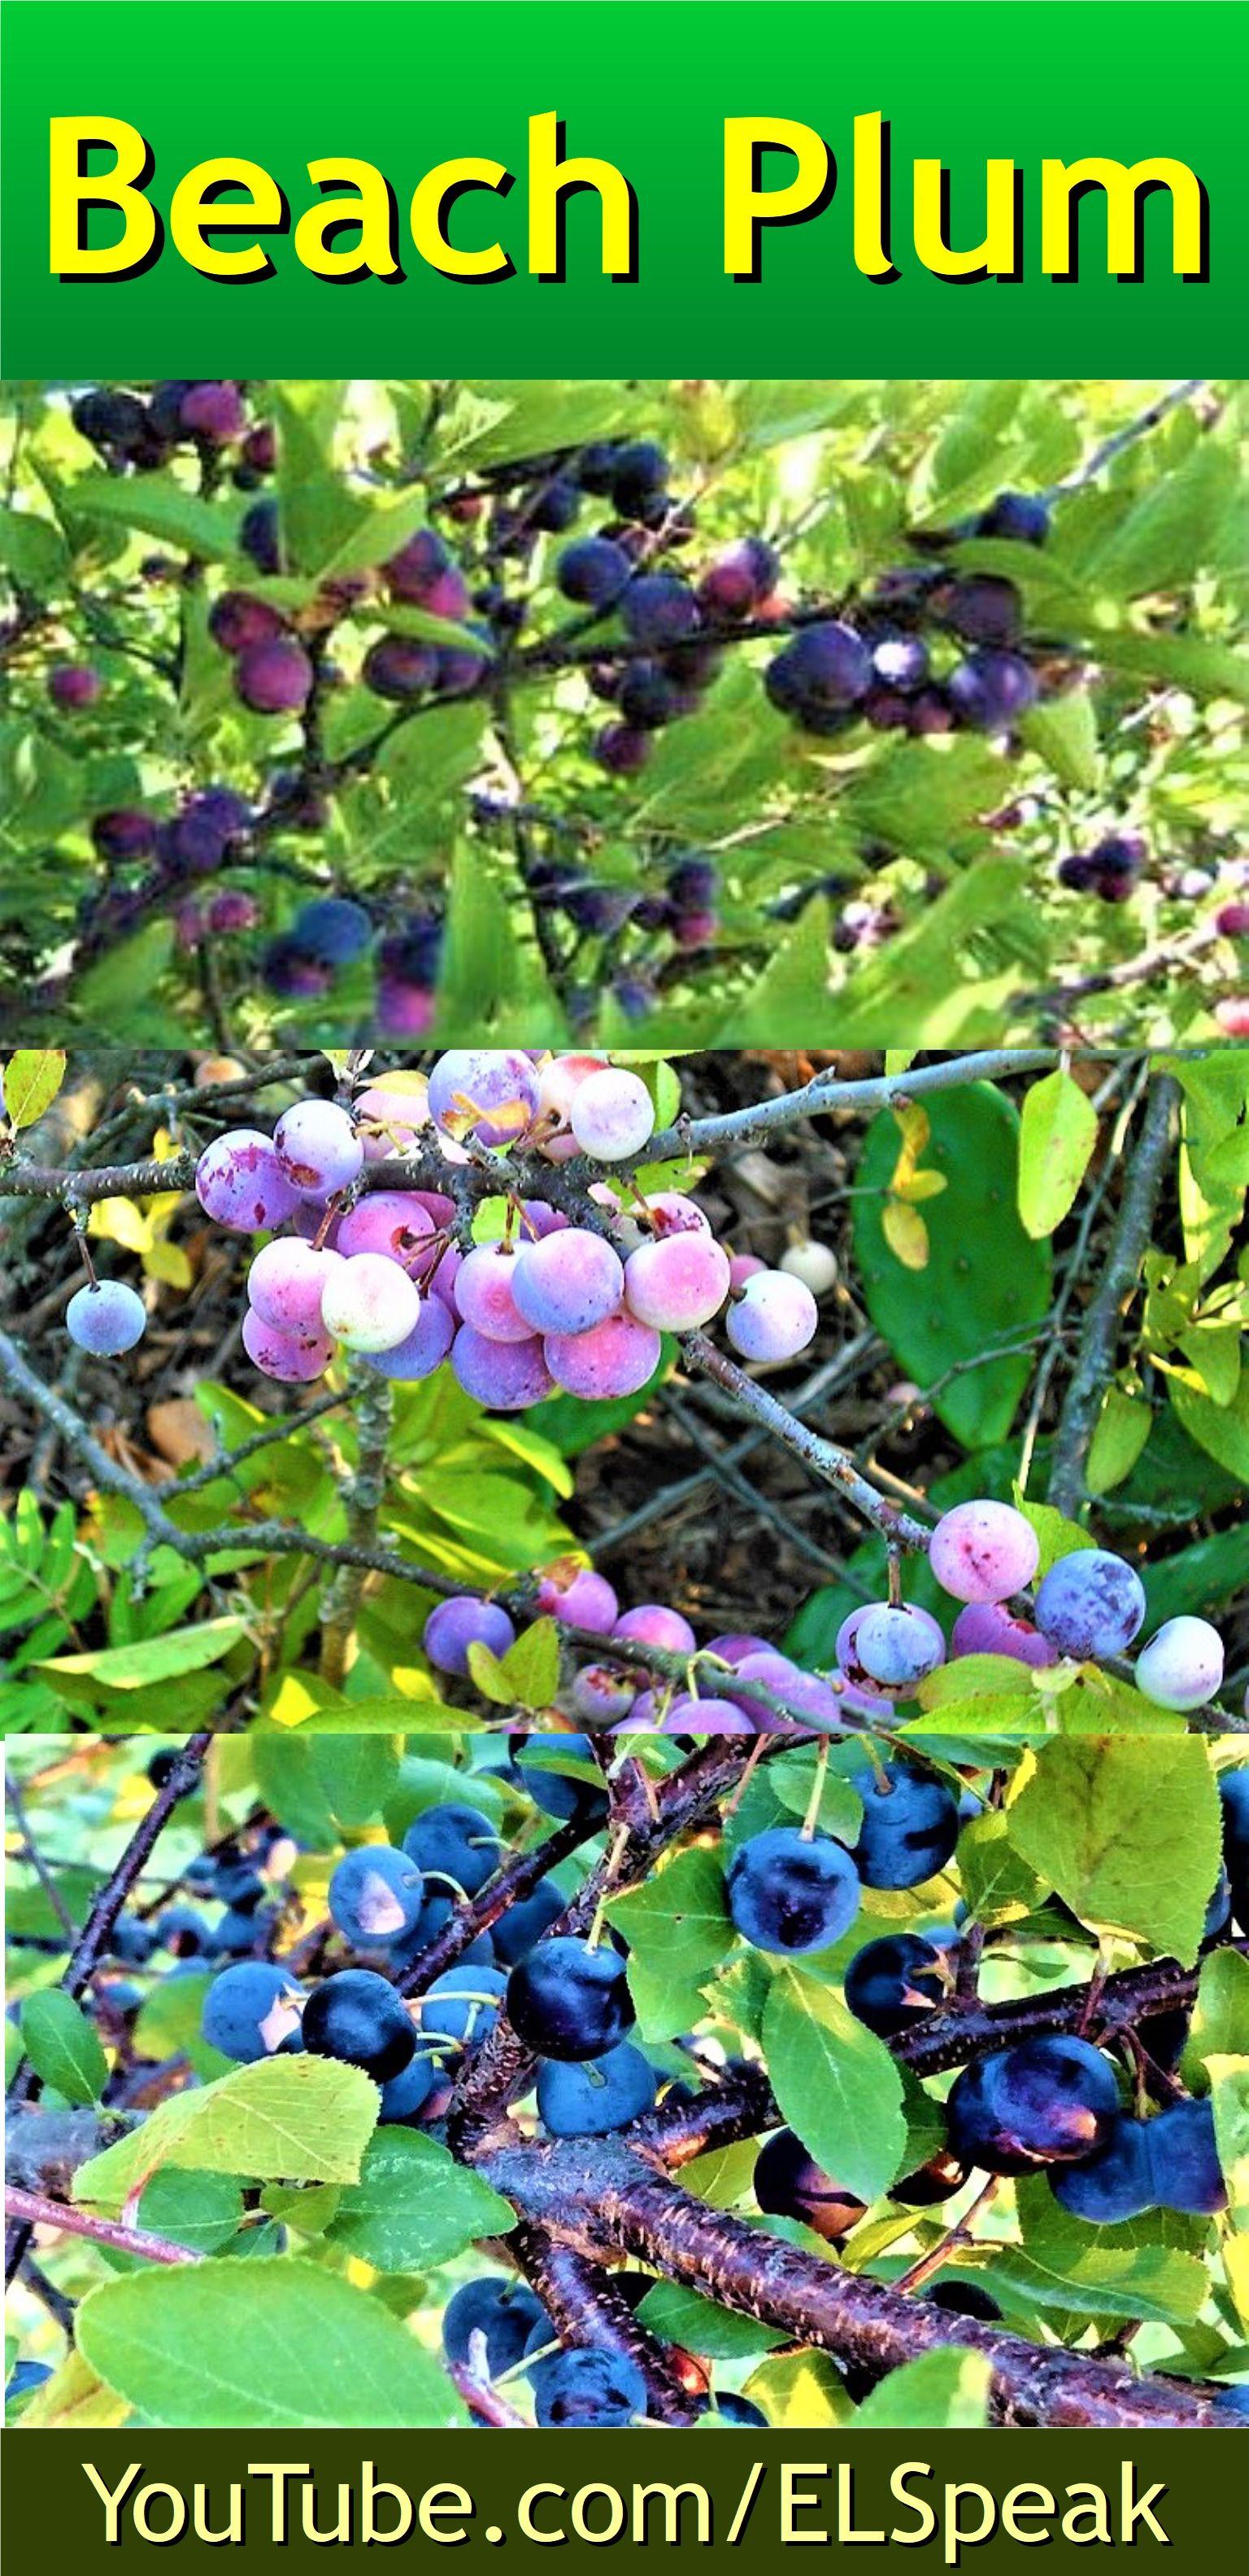 Beach Plum Fruits name in english, Fruit list, Fruit names